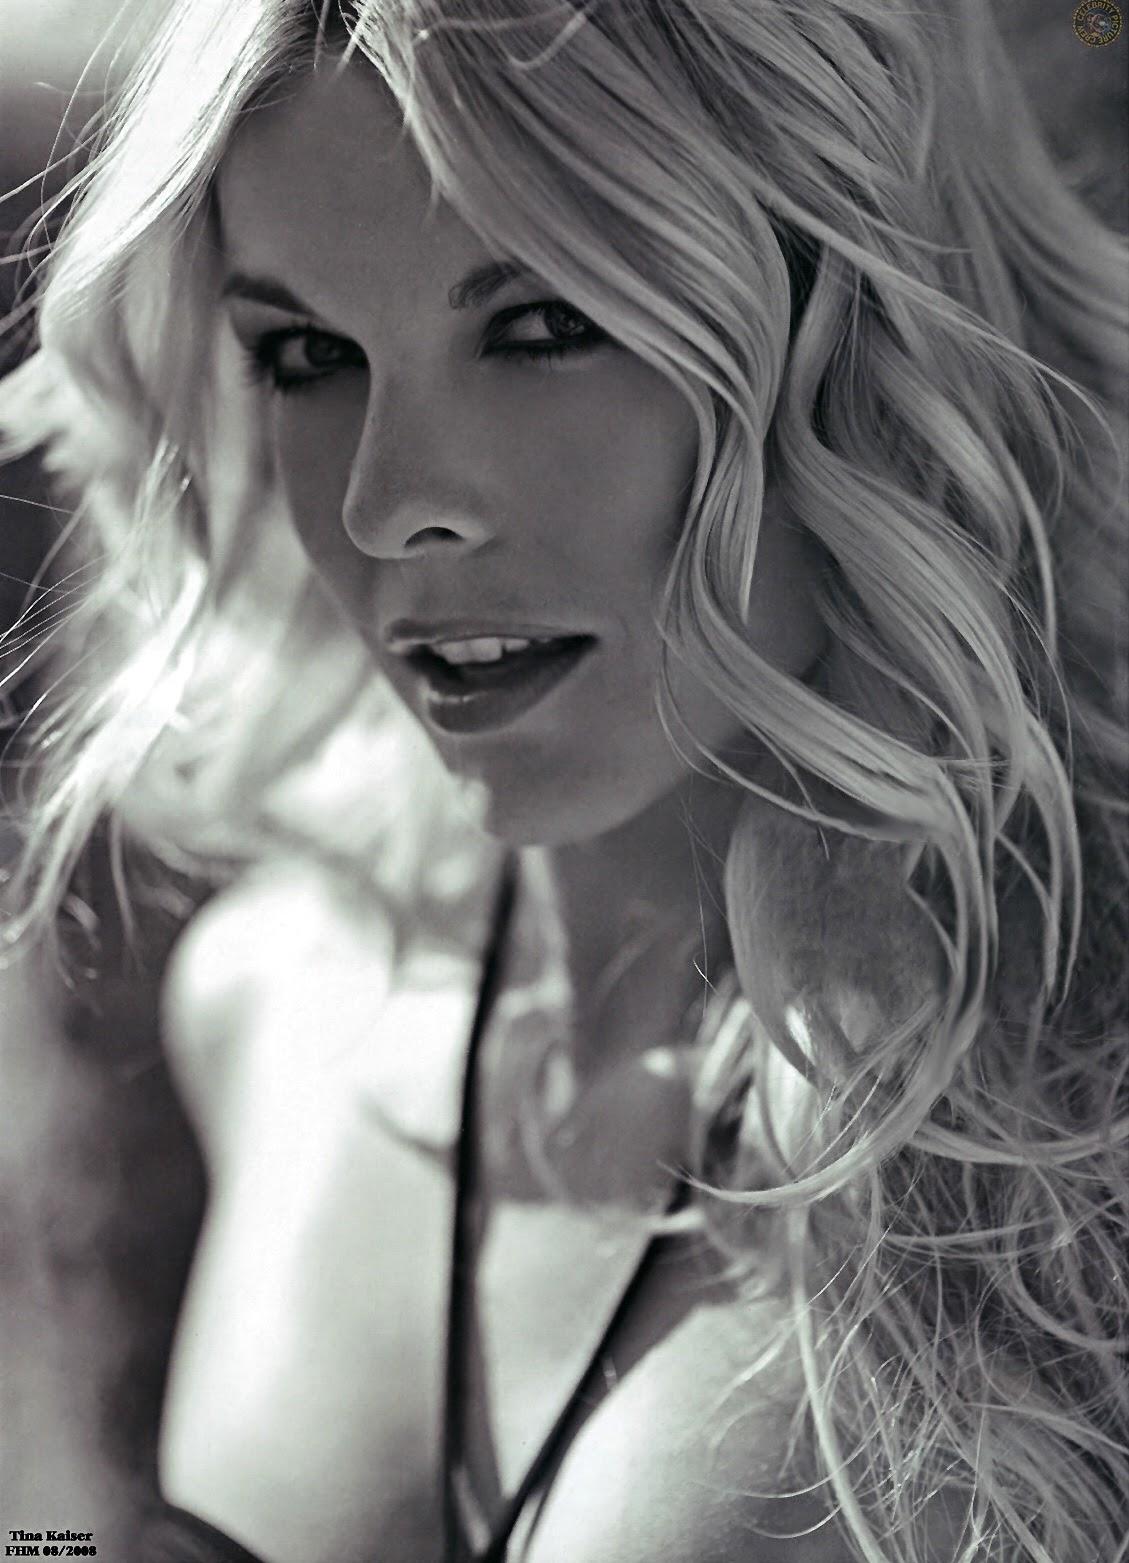 Tina Kaiser Nude FHM Magazine